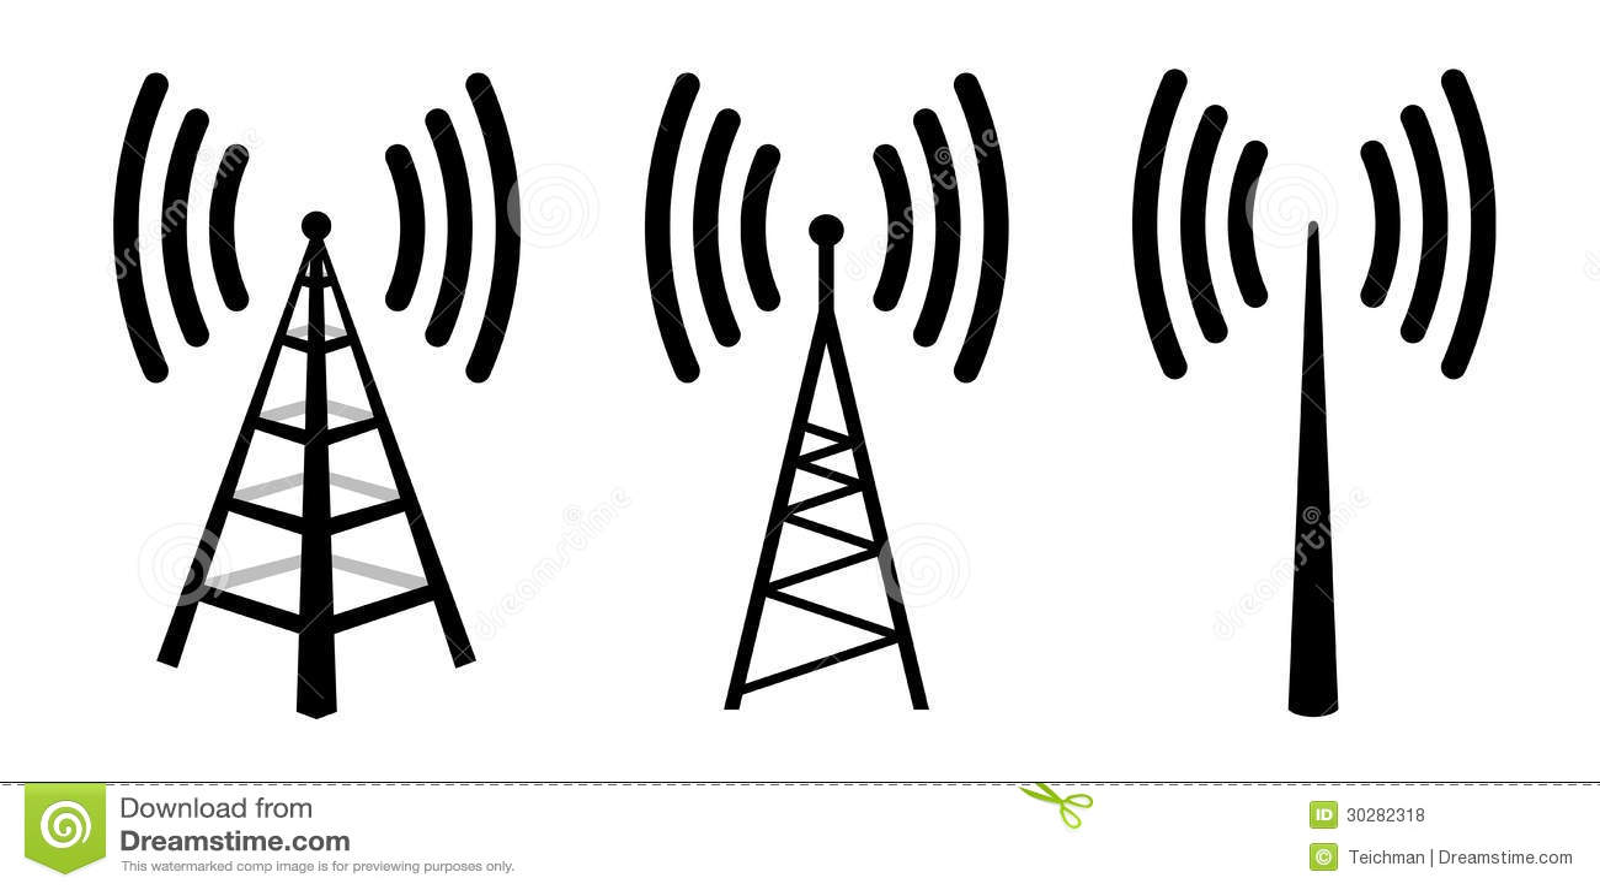 Radio antenna stock vector. Illustration of